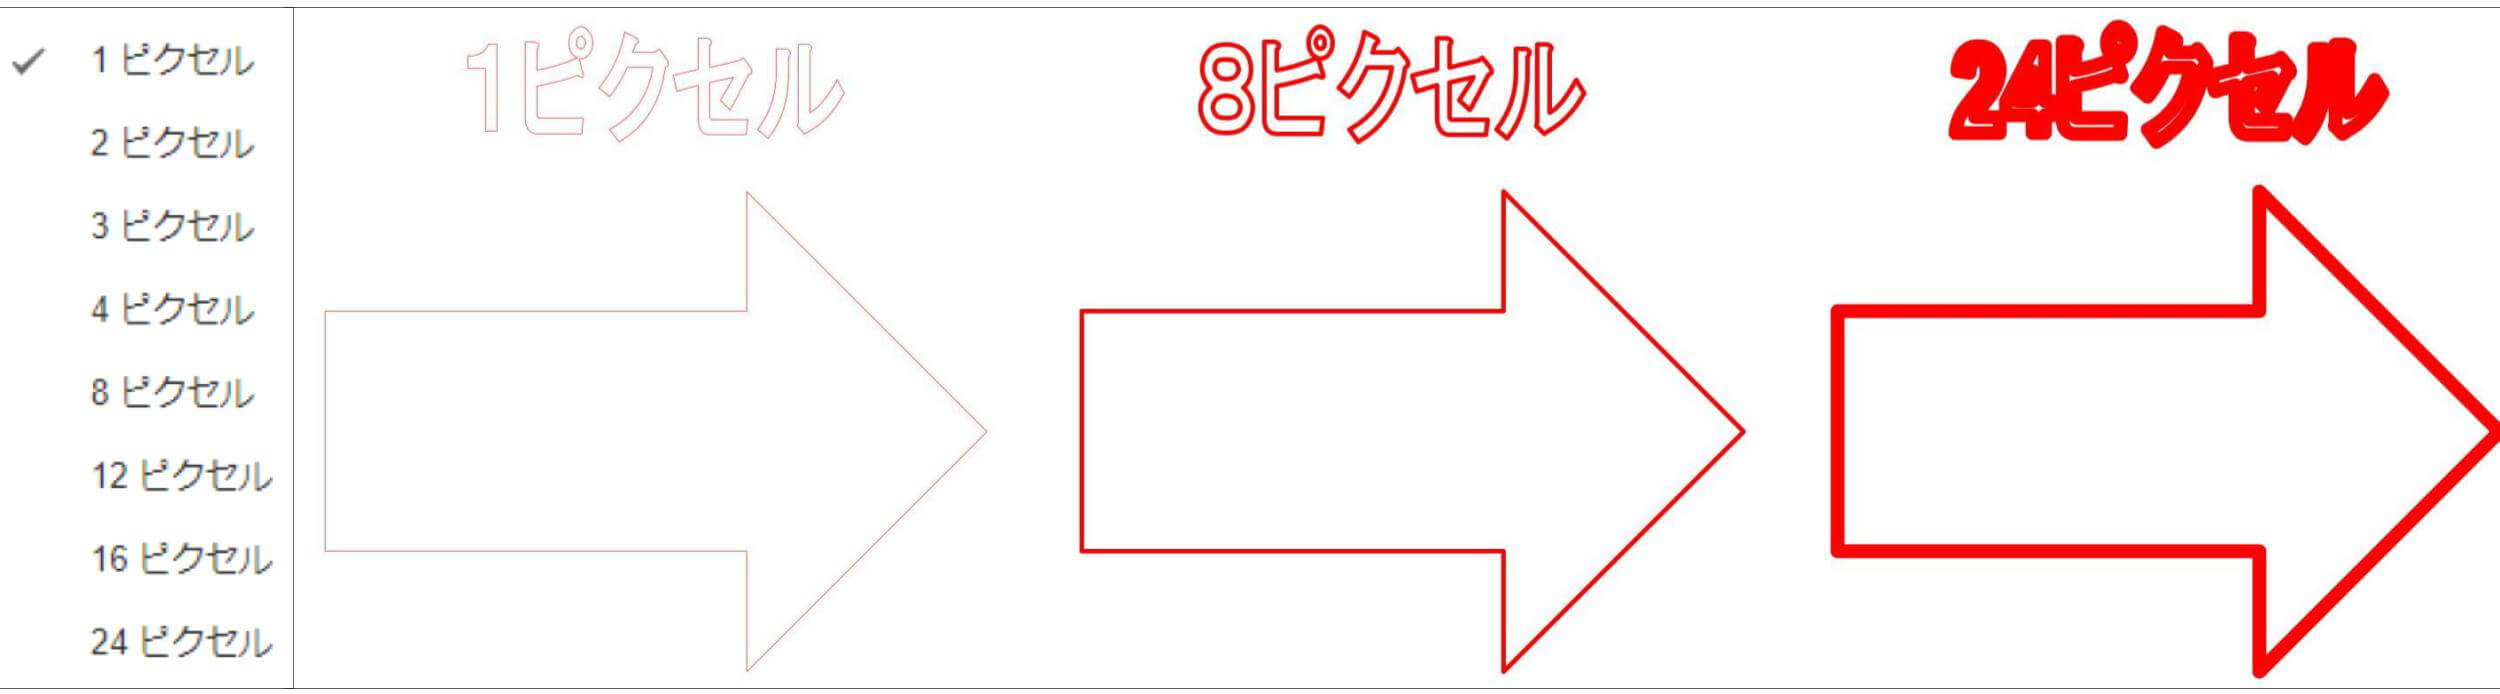 Google図形描画 ツールバー枠線の太さ ピクセル選択とパターン